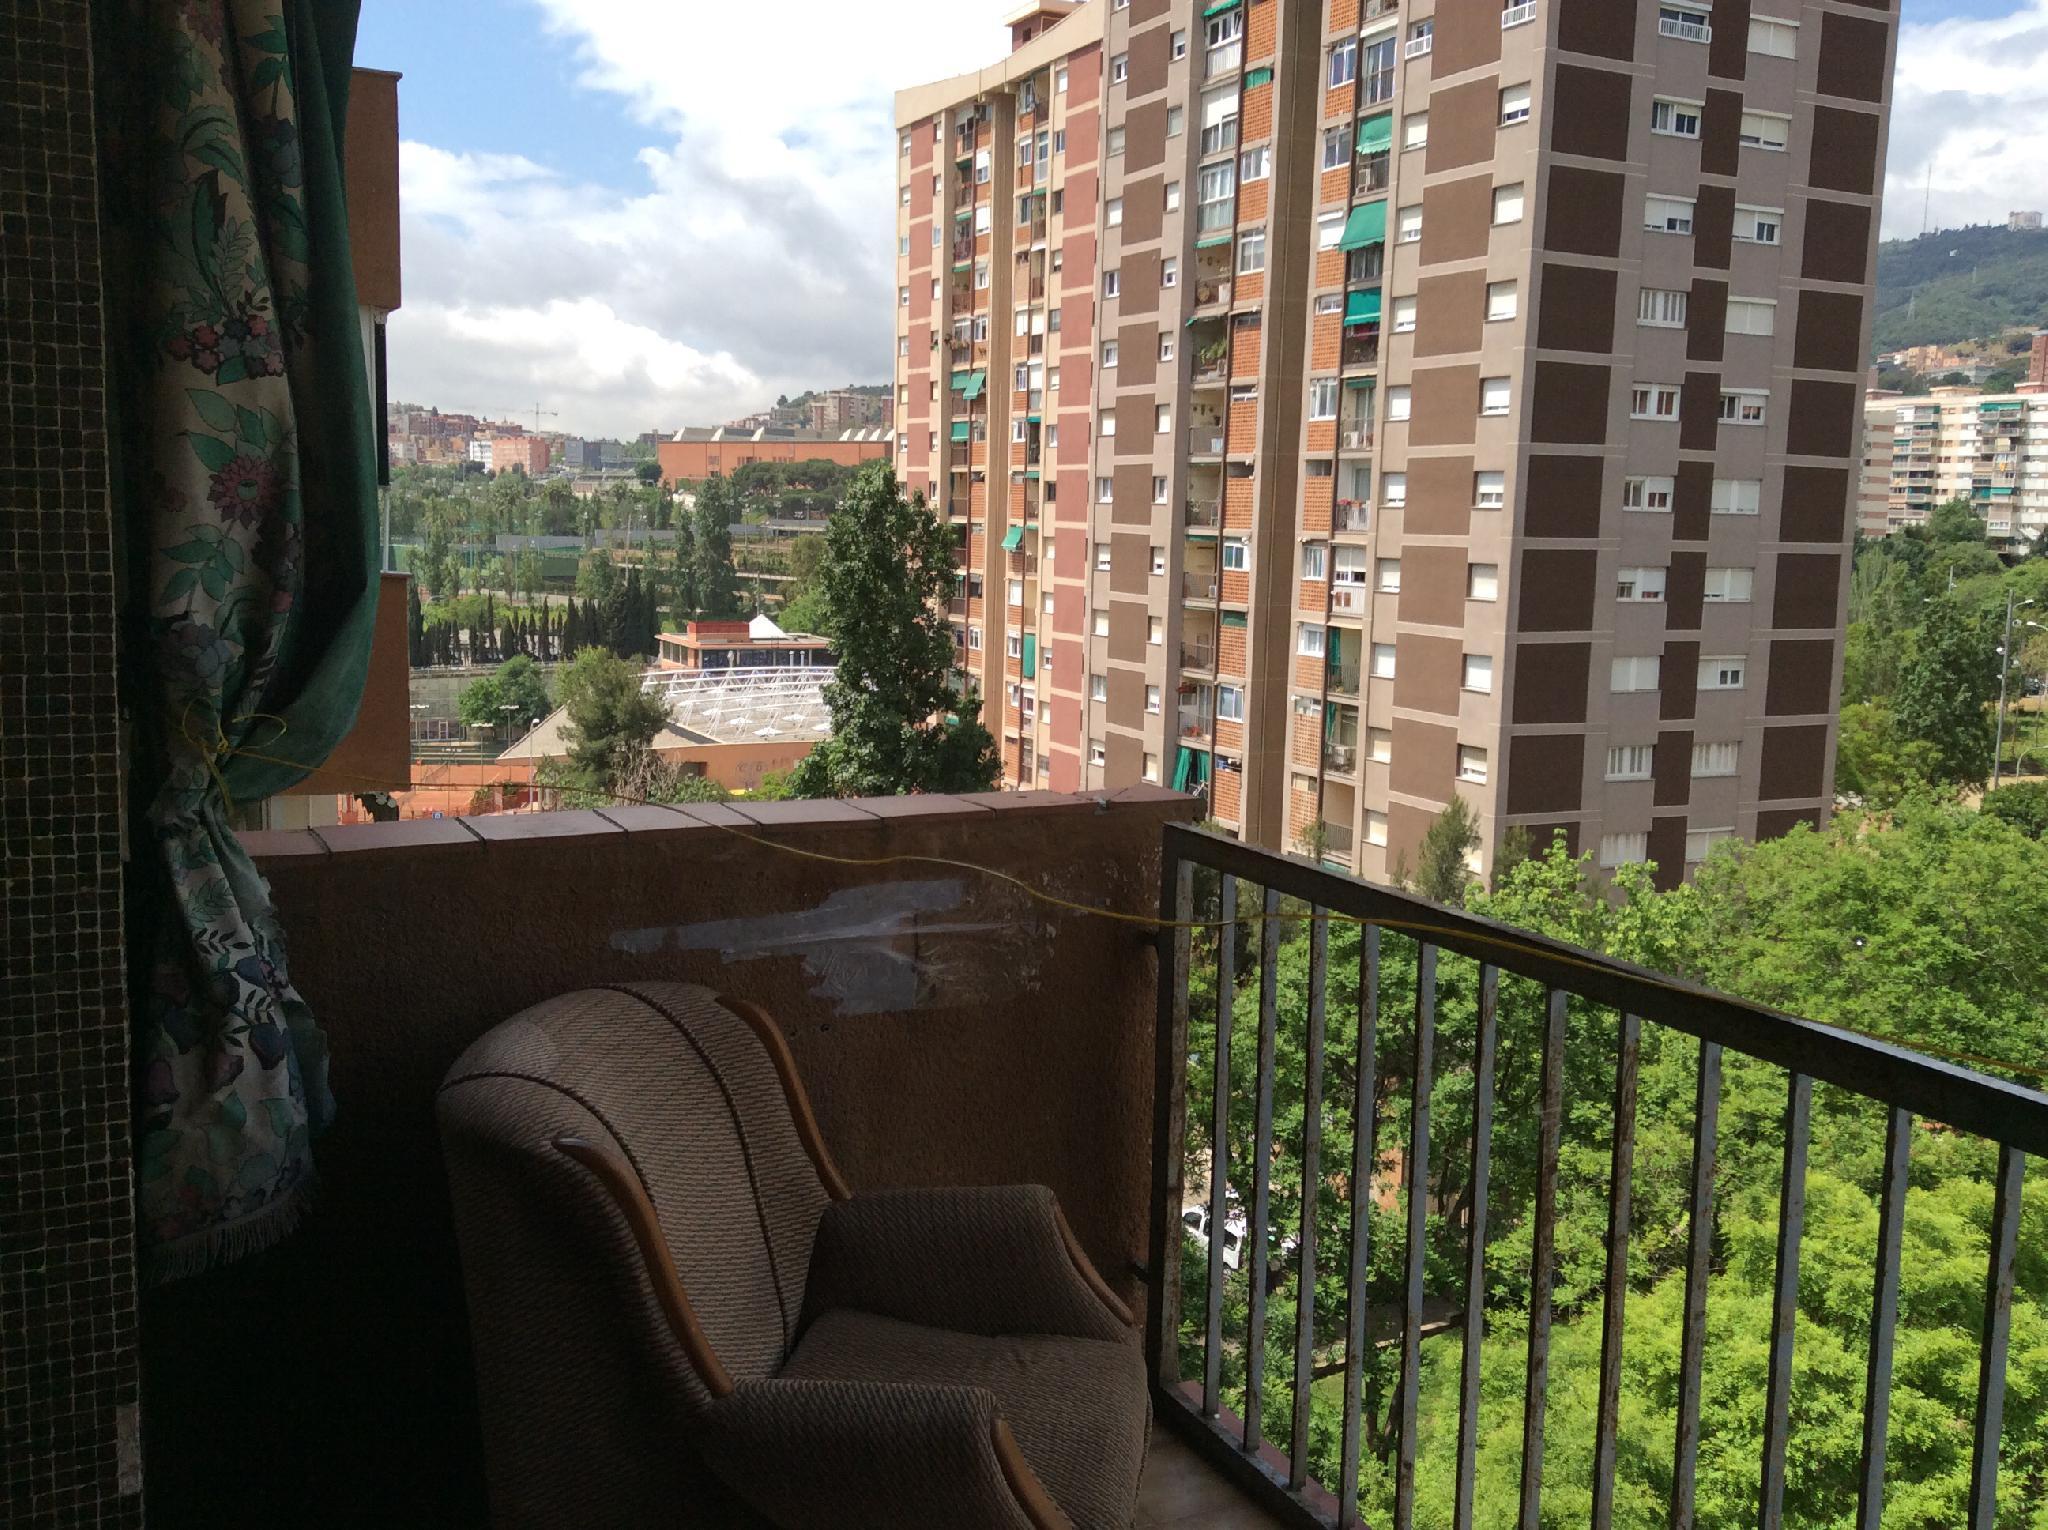 flat-for-sale-in-junto-residencia-sanitaria-valle-de-hebron-la-vall-d´hebron-in-barcelona